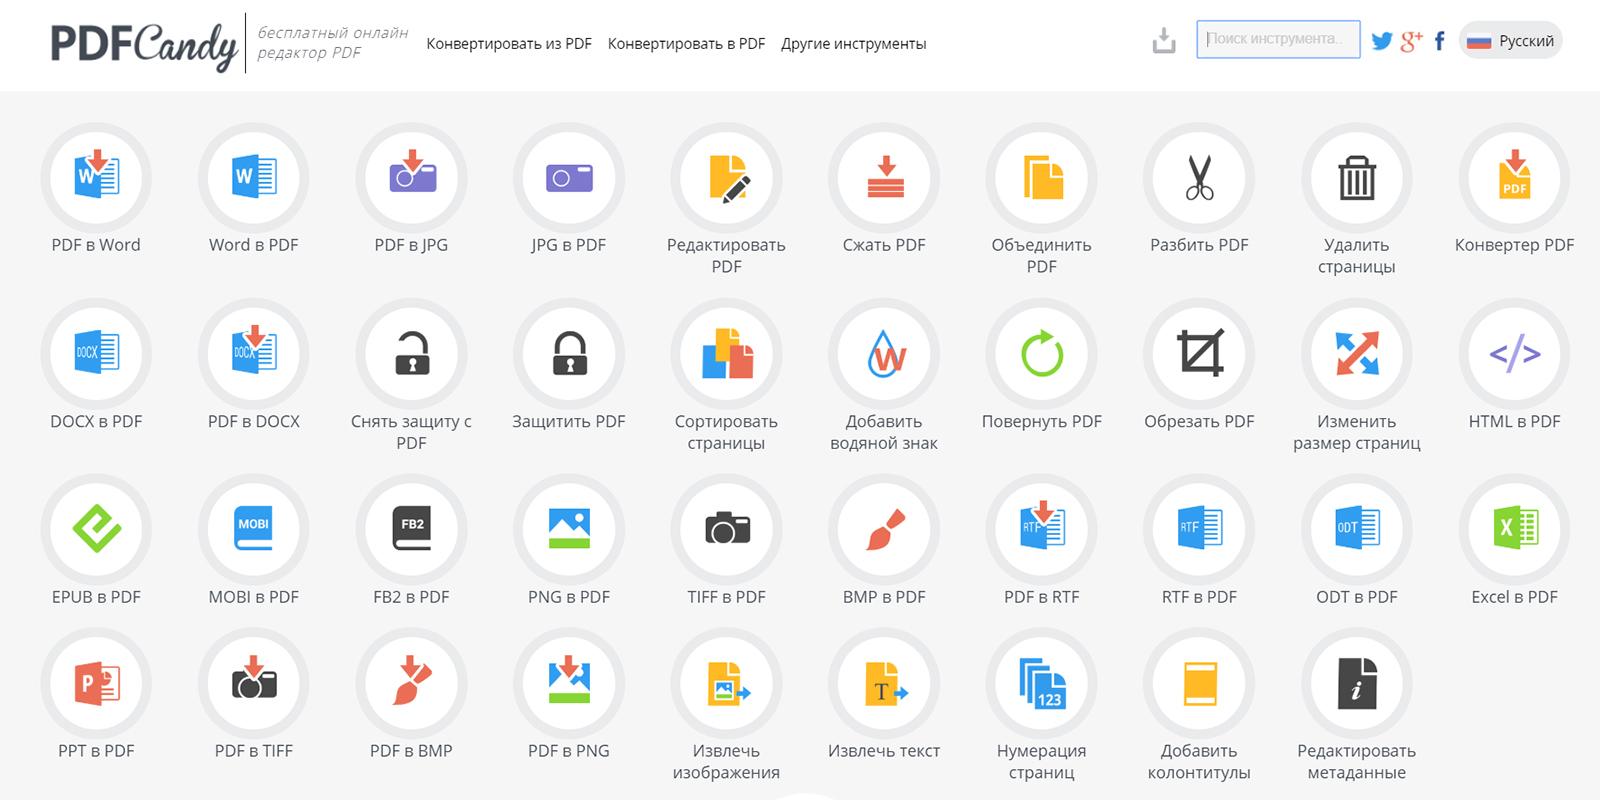 Онлайн-редакторы PDF: PDF Candy